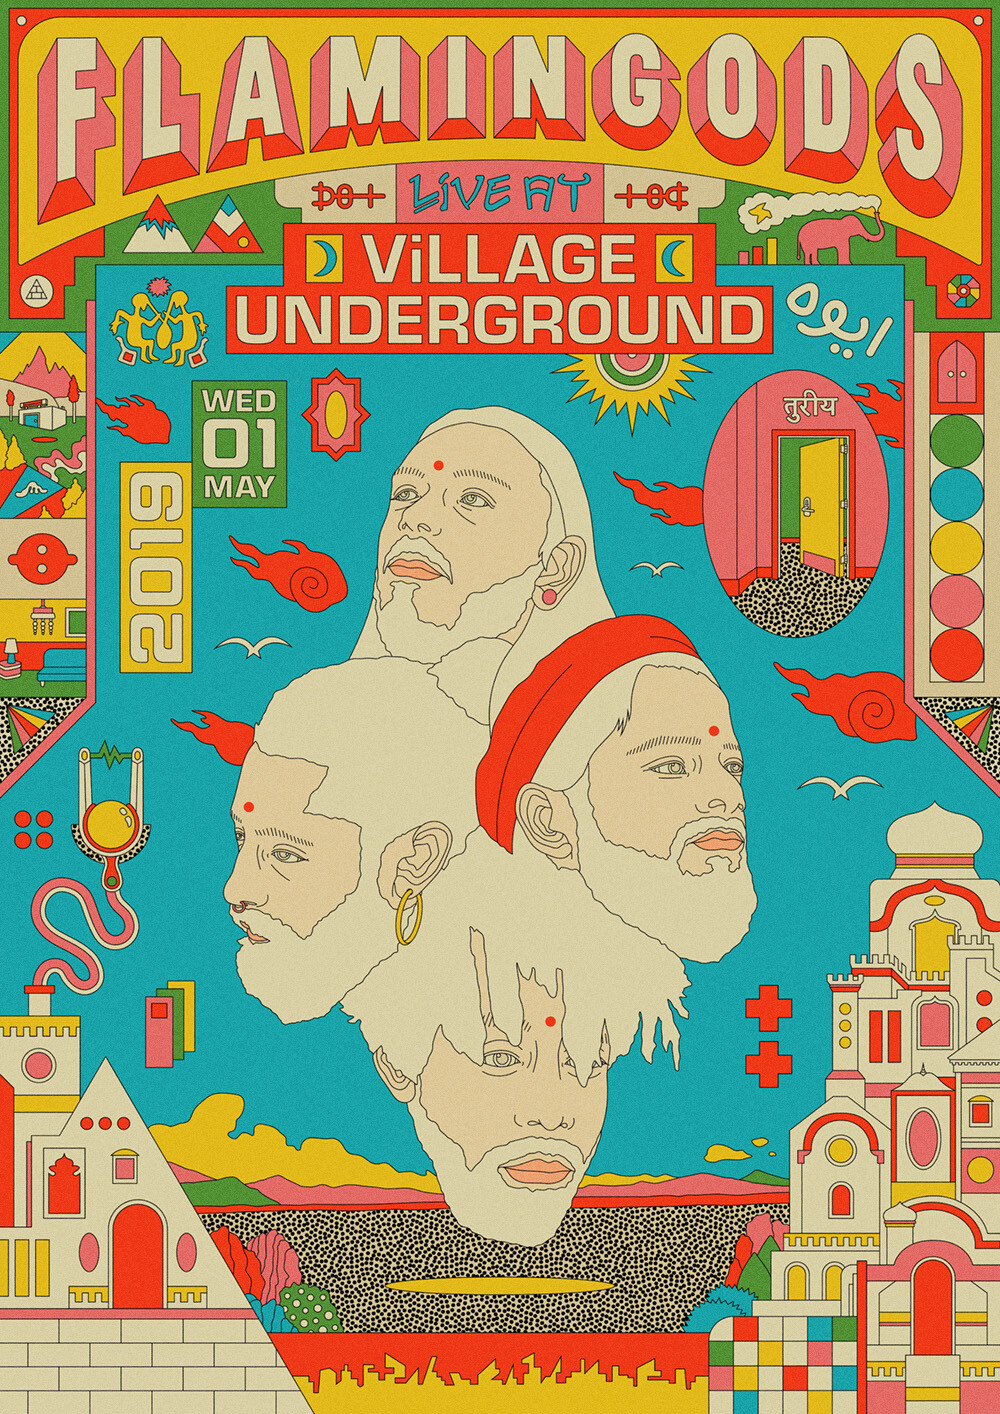 Flamingods: Live at Village Underground